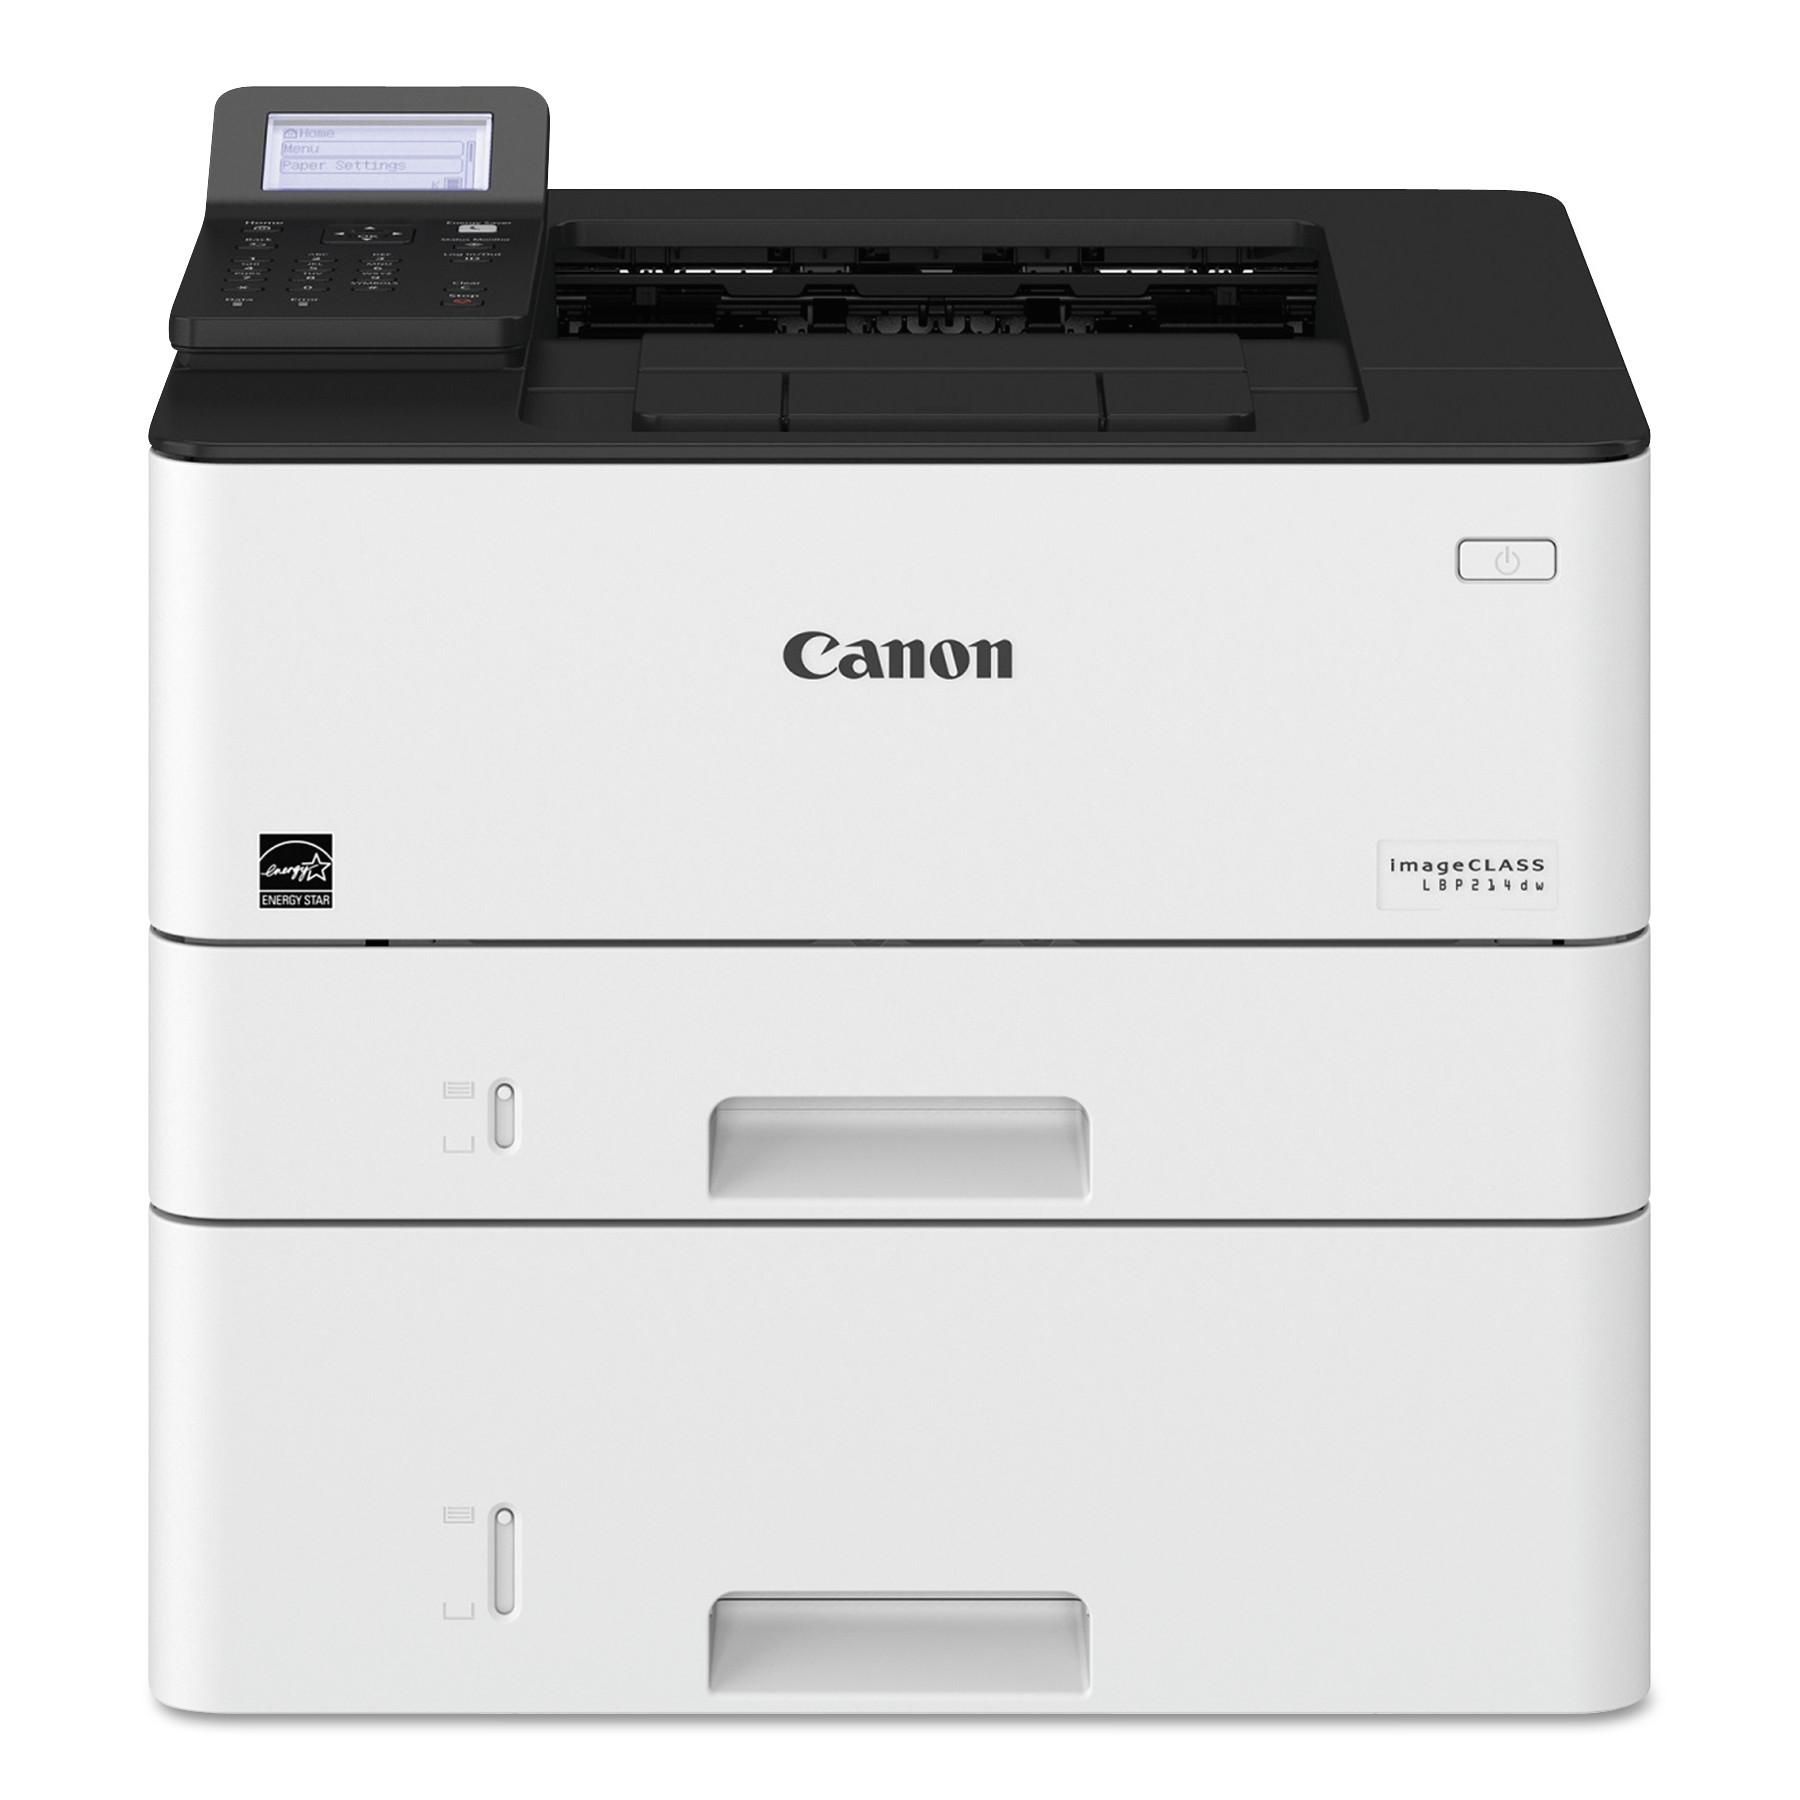 ImageCLASS LBP214dw Wireless Laser Printer